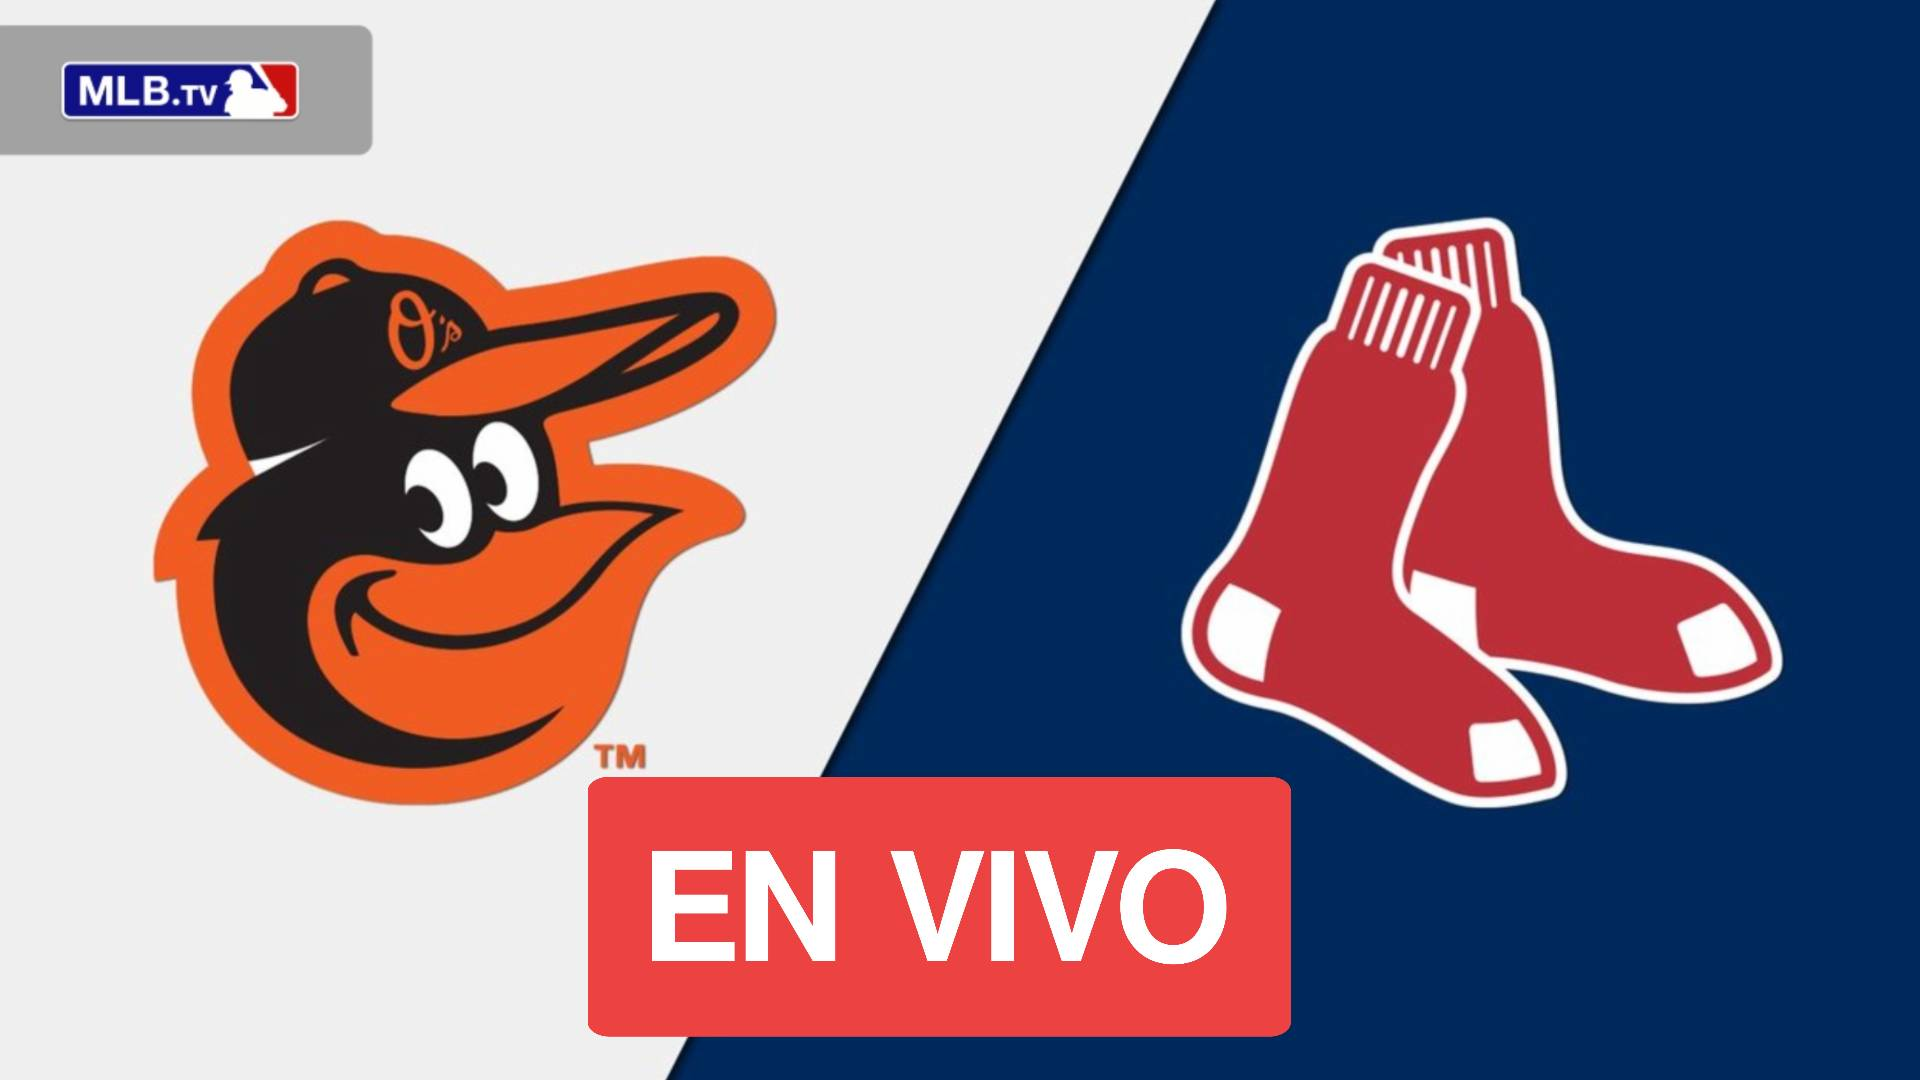 ORIOLES VS RED SOX EN VIVO ONLINE GRATIS MLB 2021 ONLINE FREE